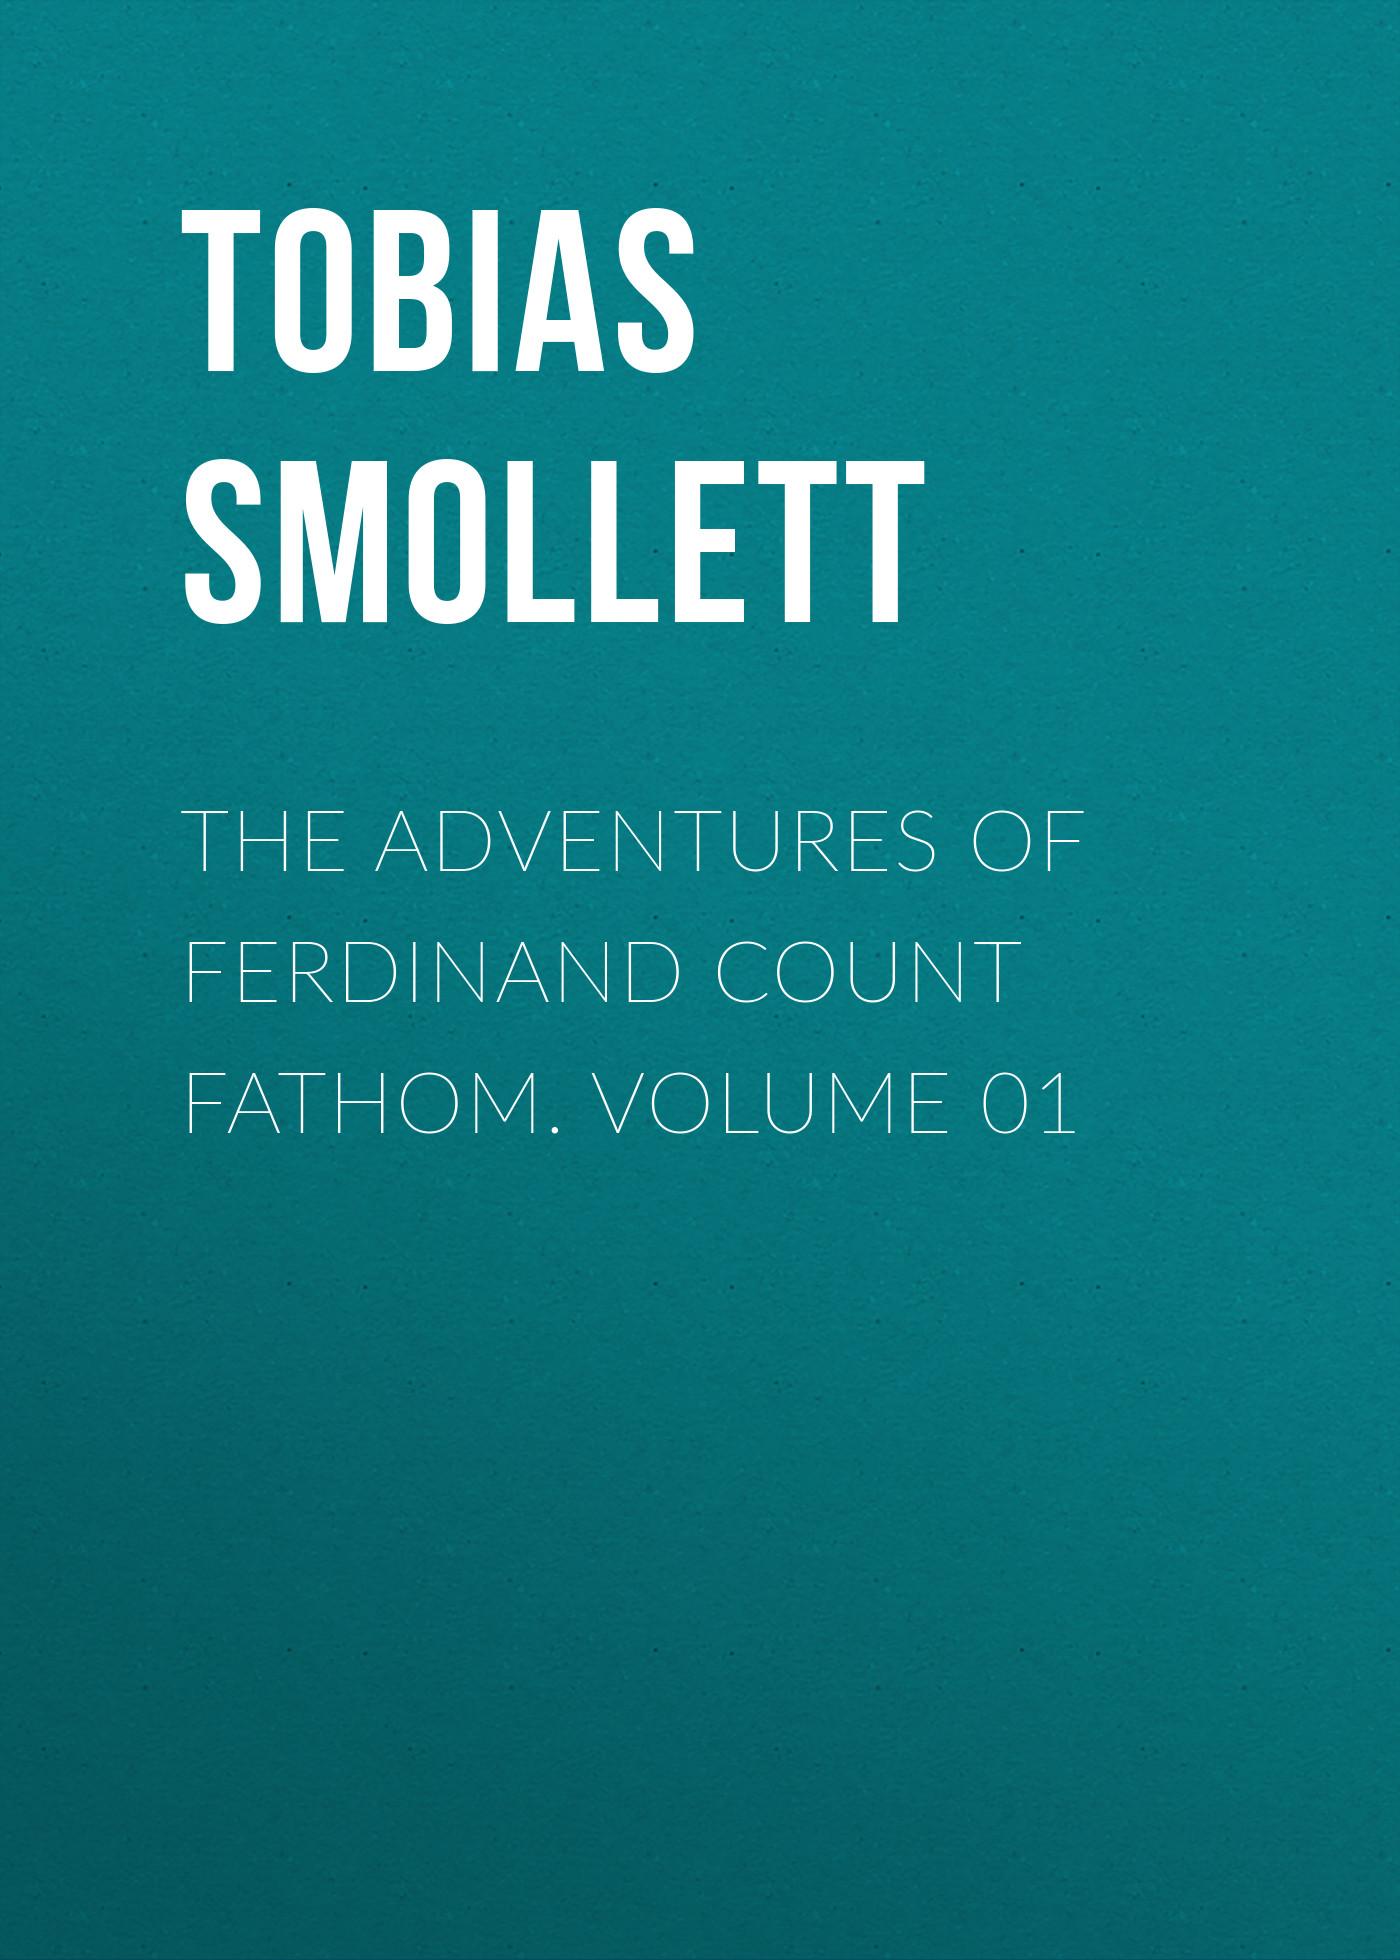 Tobias Smollett The Adventures of Ferdinand Count Fathom. Volume 01 tobias smollett travels through france and italy